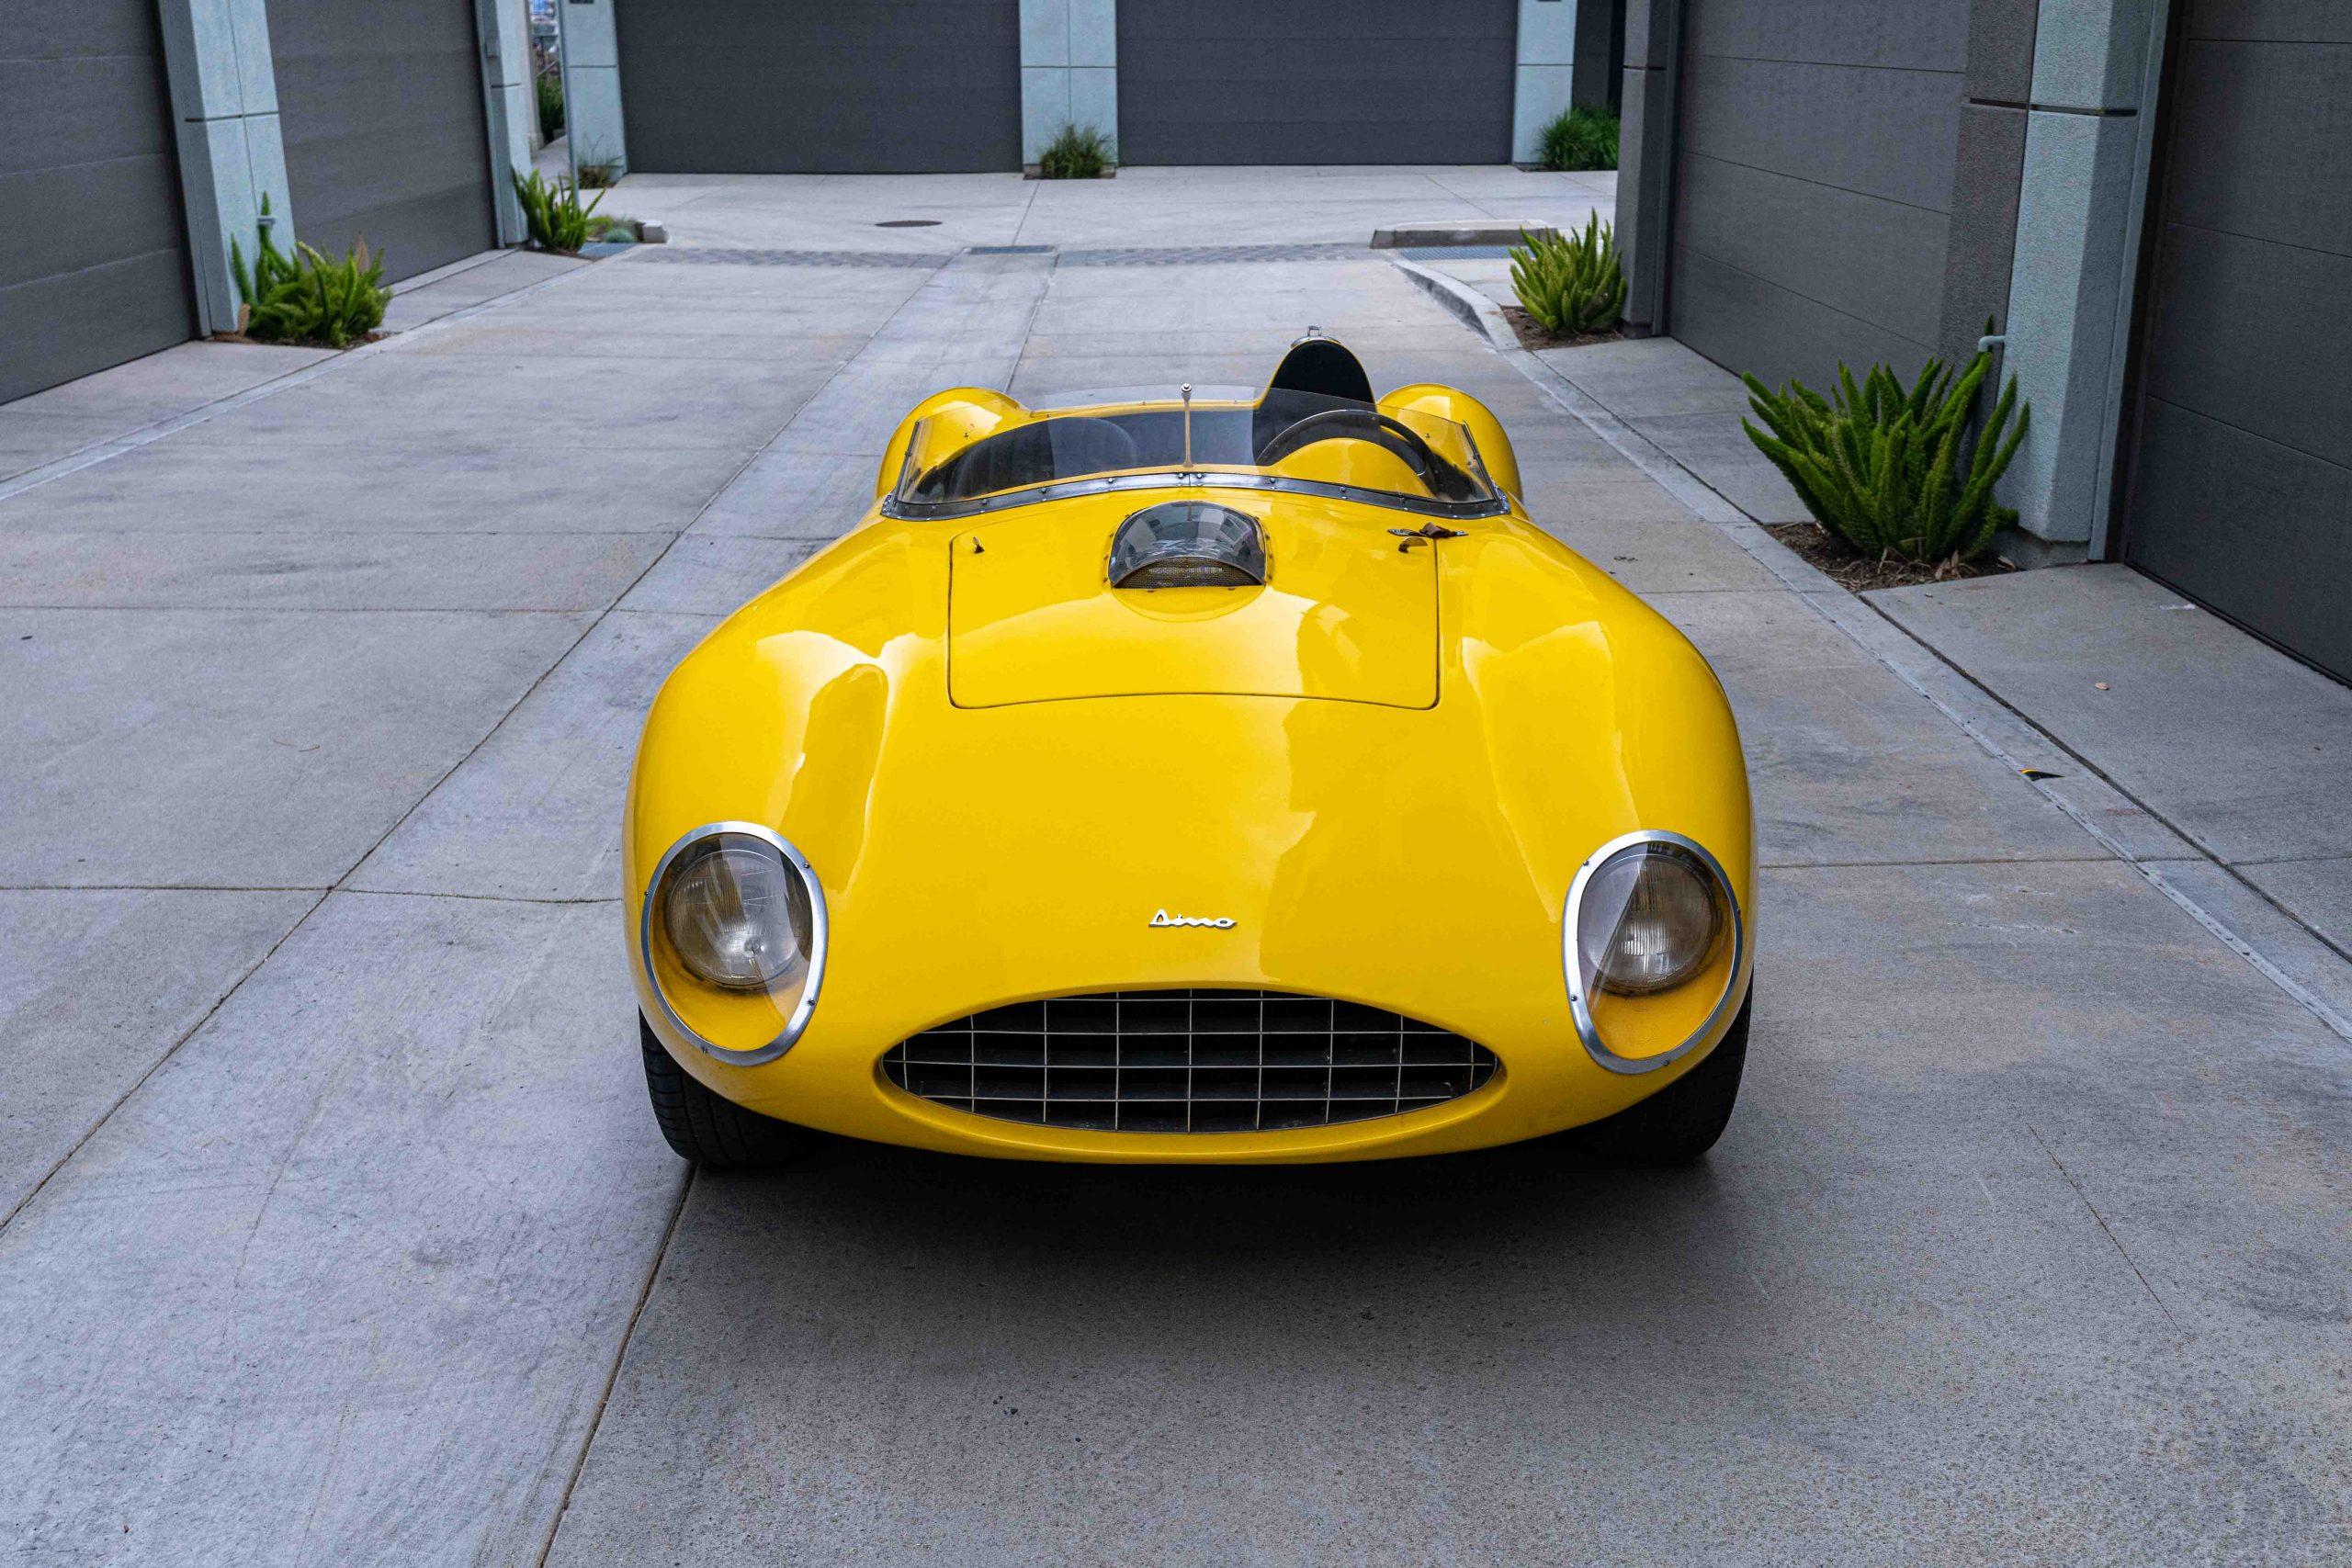 1957 Ferrari 196 SP front view